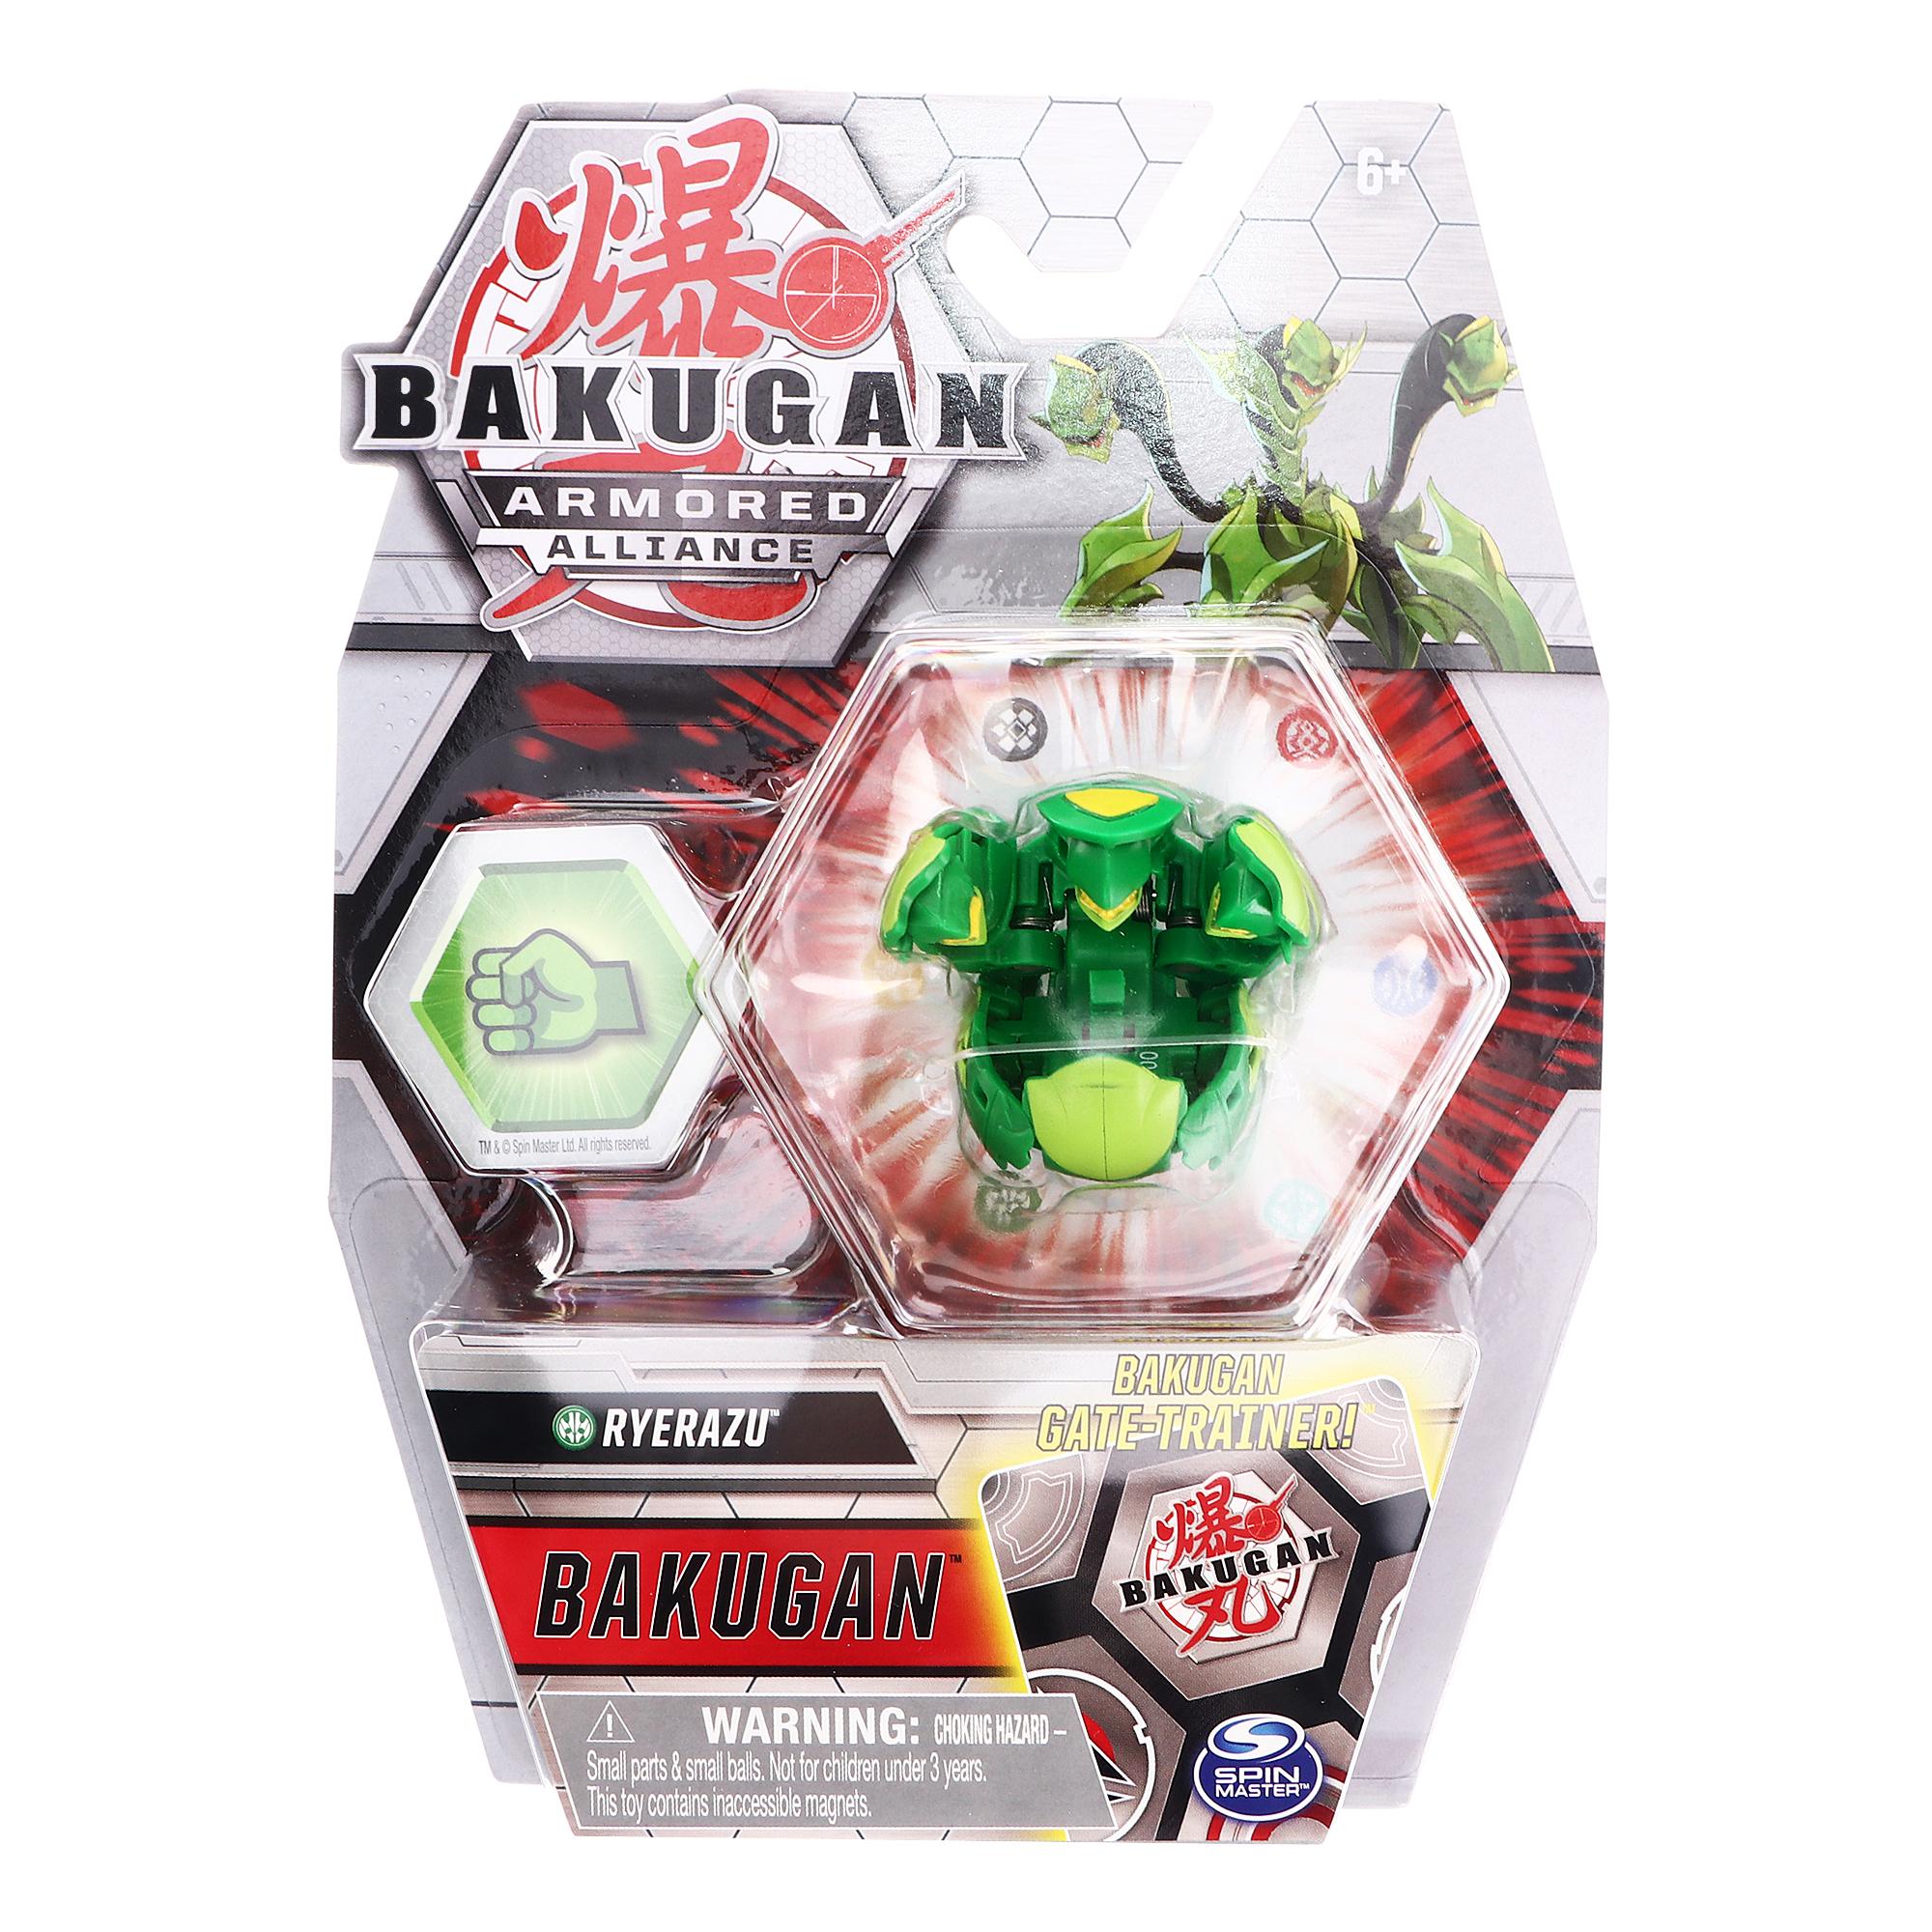 Фигурка-трансформер Bakugan Сезон 2 фигурка трансформер spin master bakugan в ассортименте